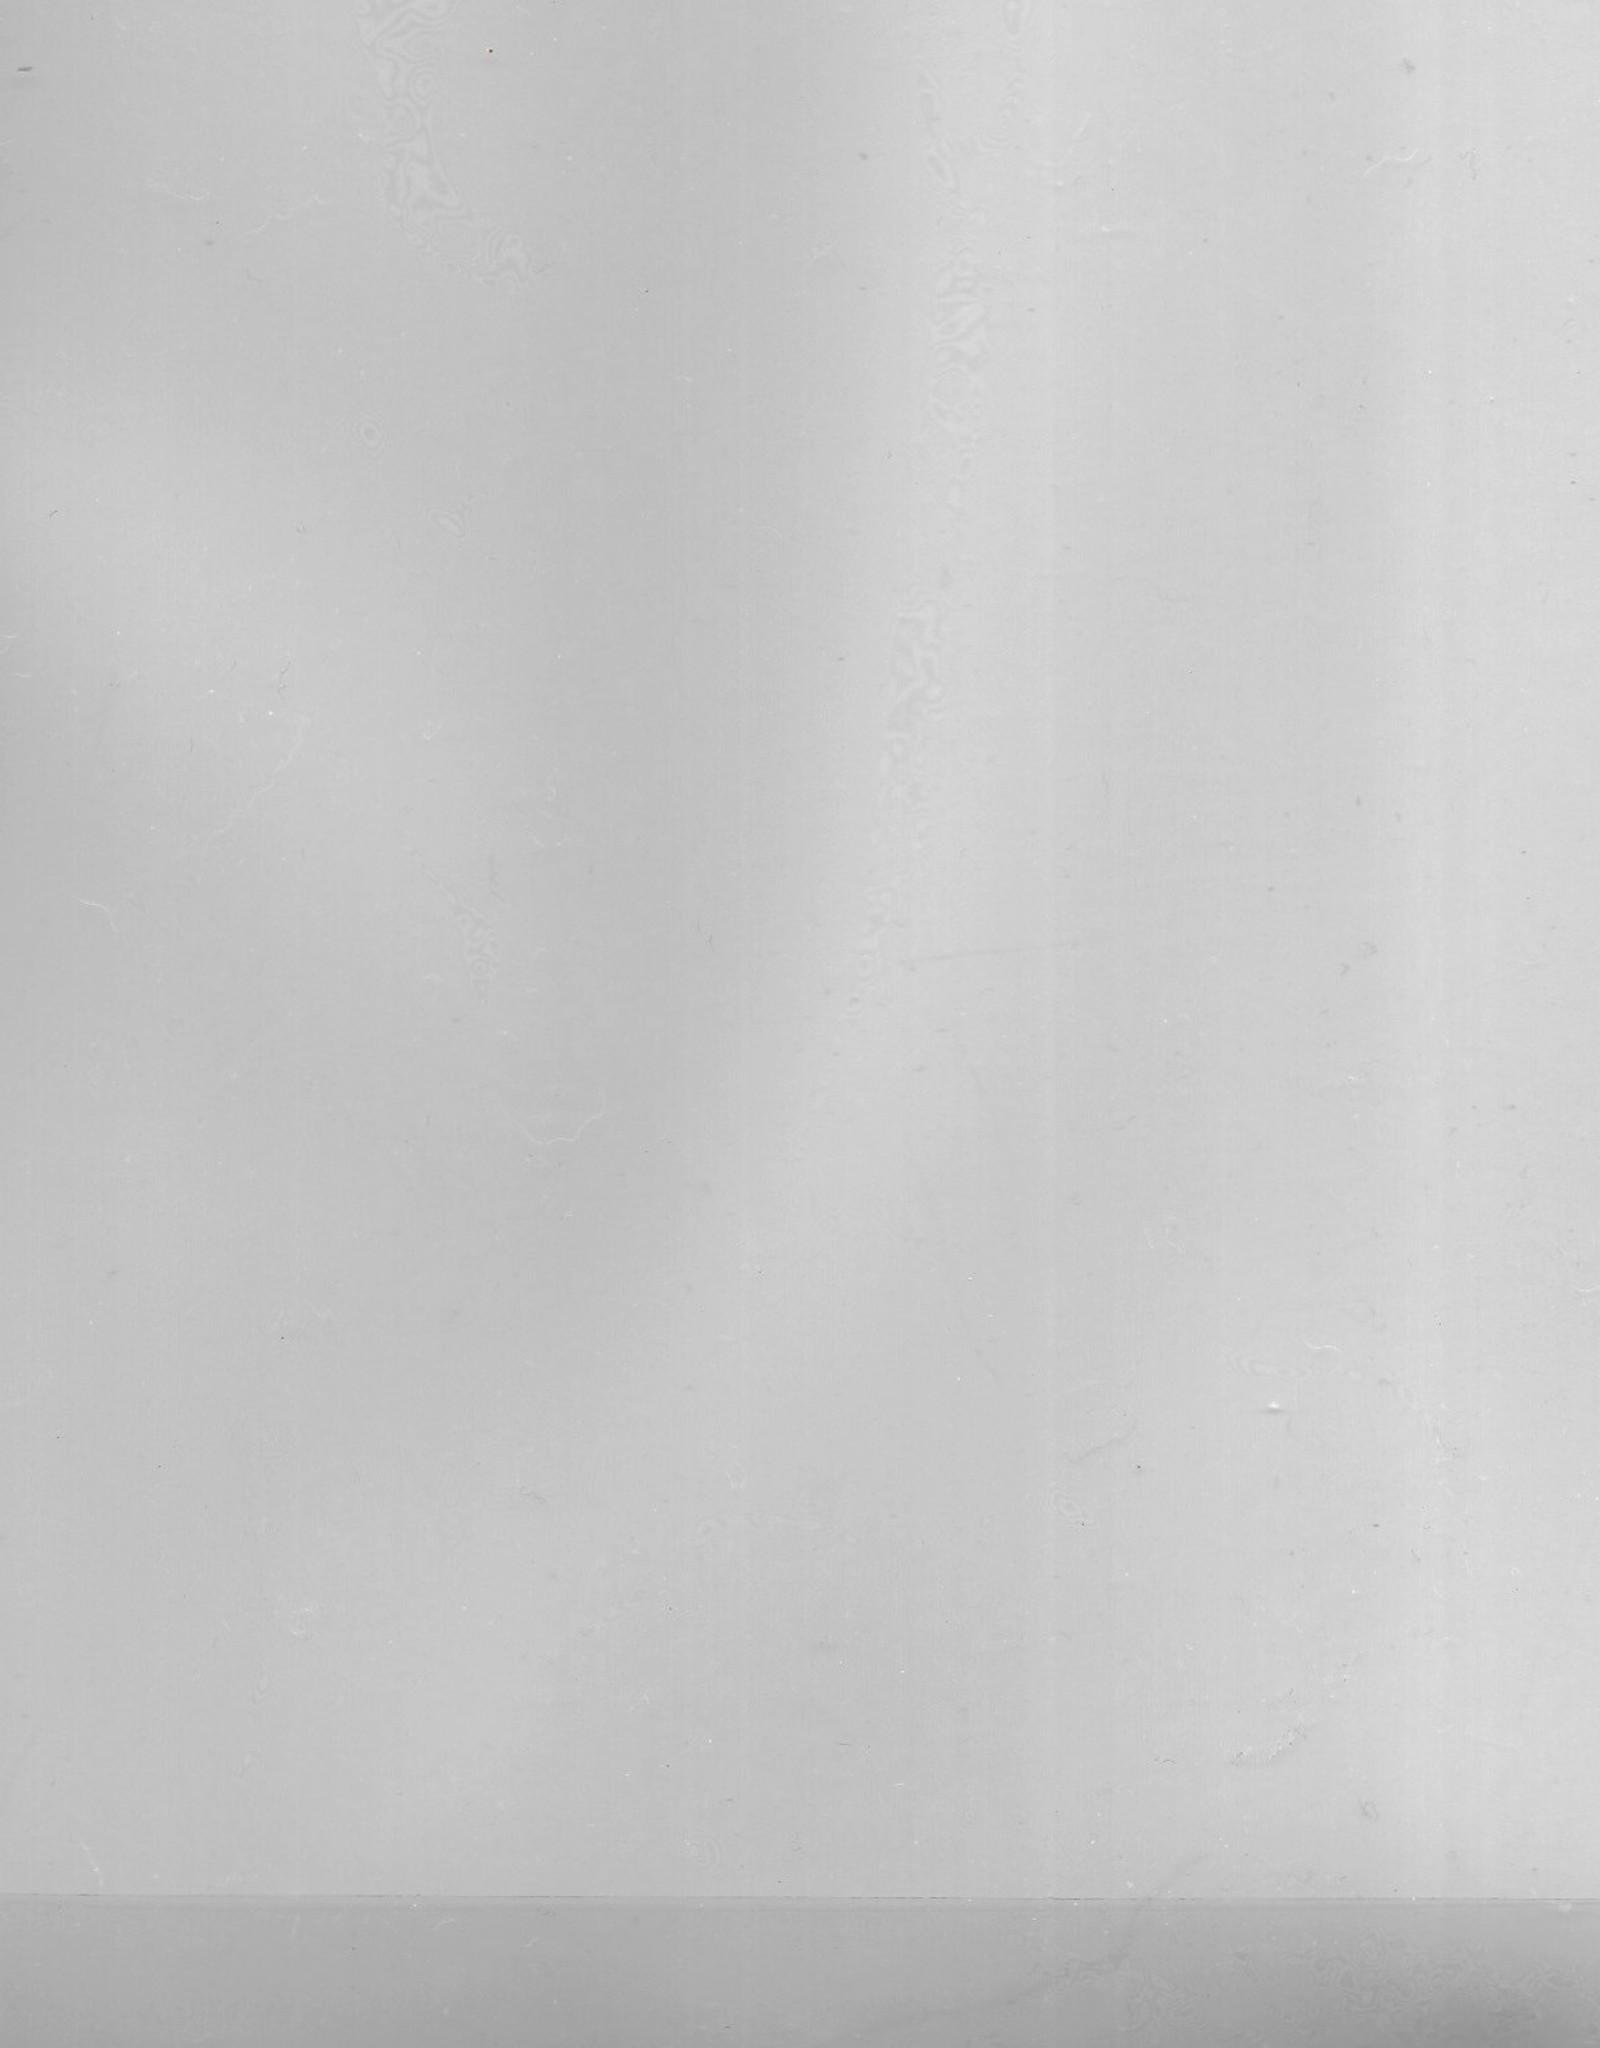 "Lineco Self Sealing L-Velopes Sleeves, 11"" x 14"", 3mil, 5 Sleeves"